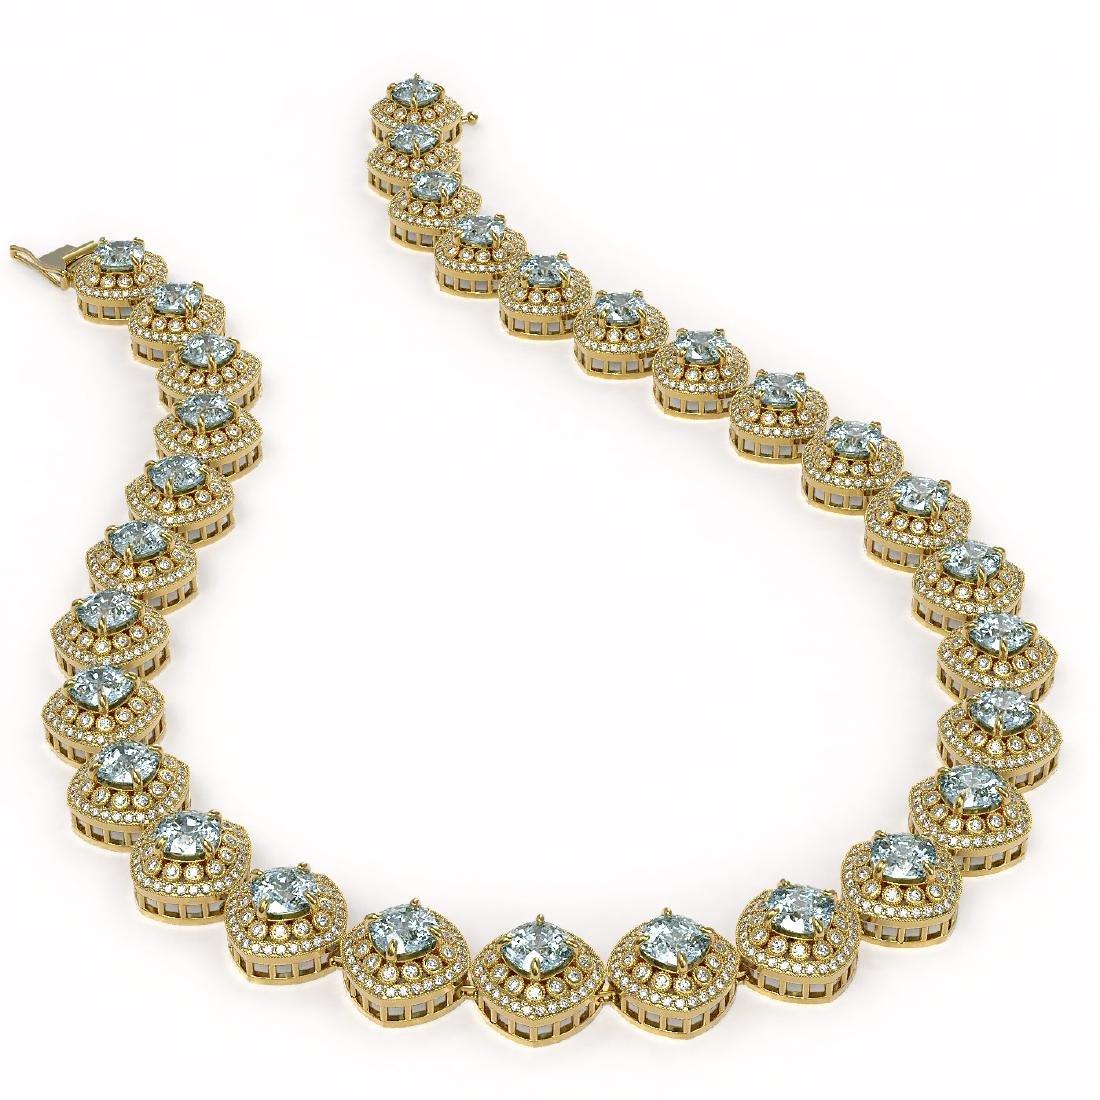 72.27 ctw Aquamarine & Diamond Necklace 14K Yellow Gold - 2